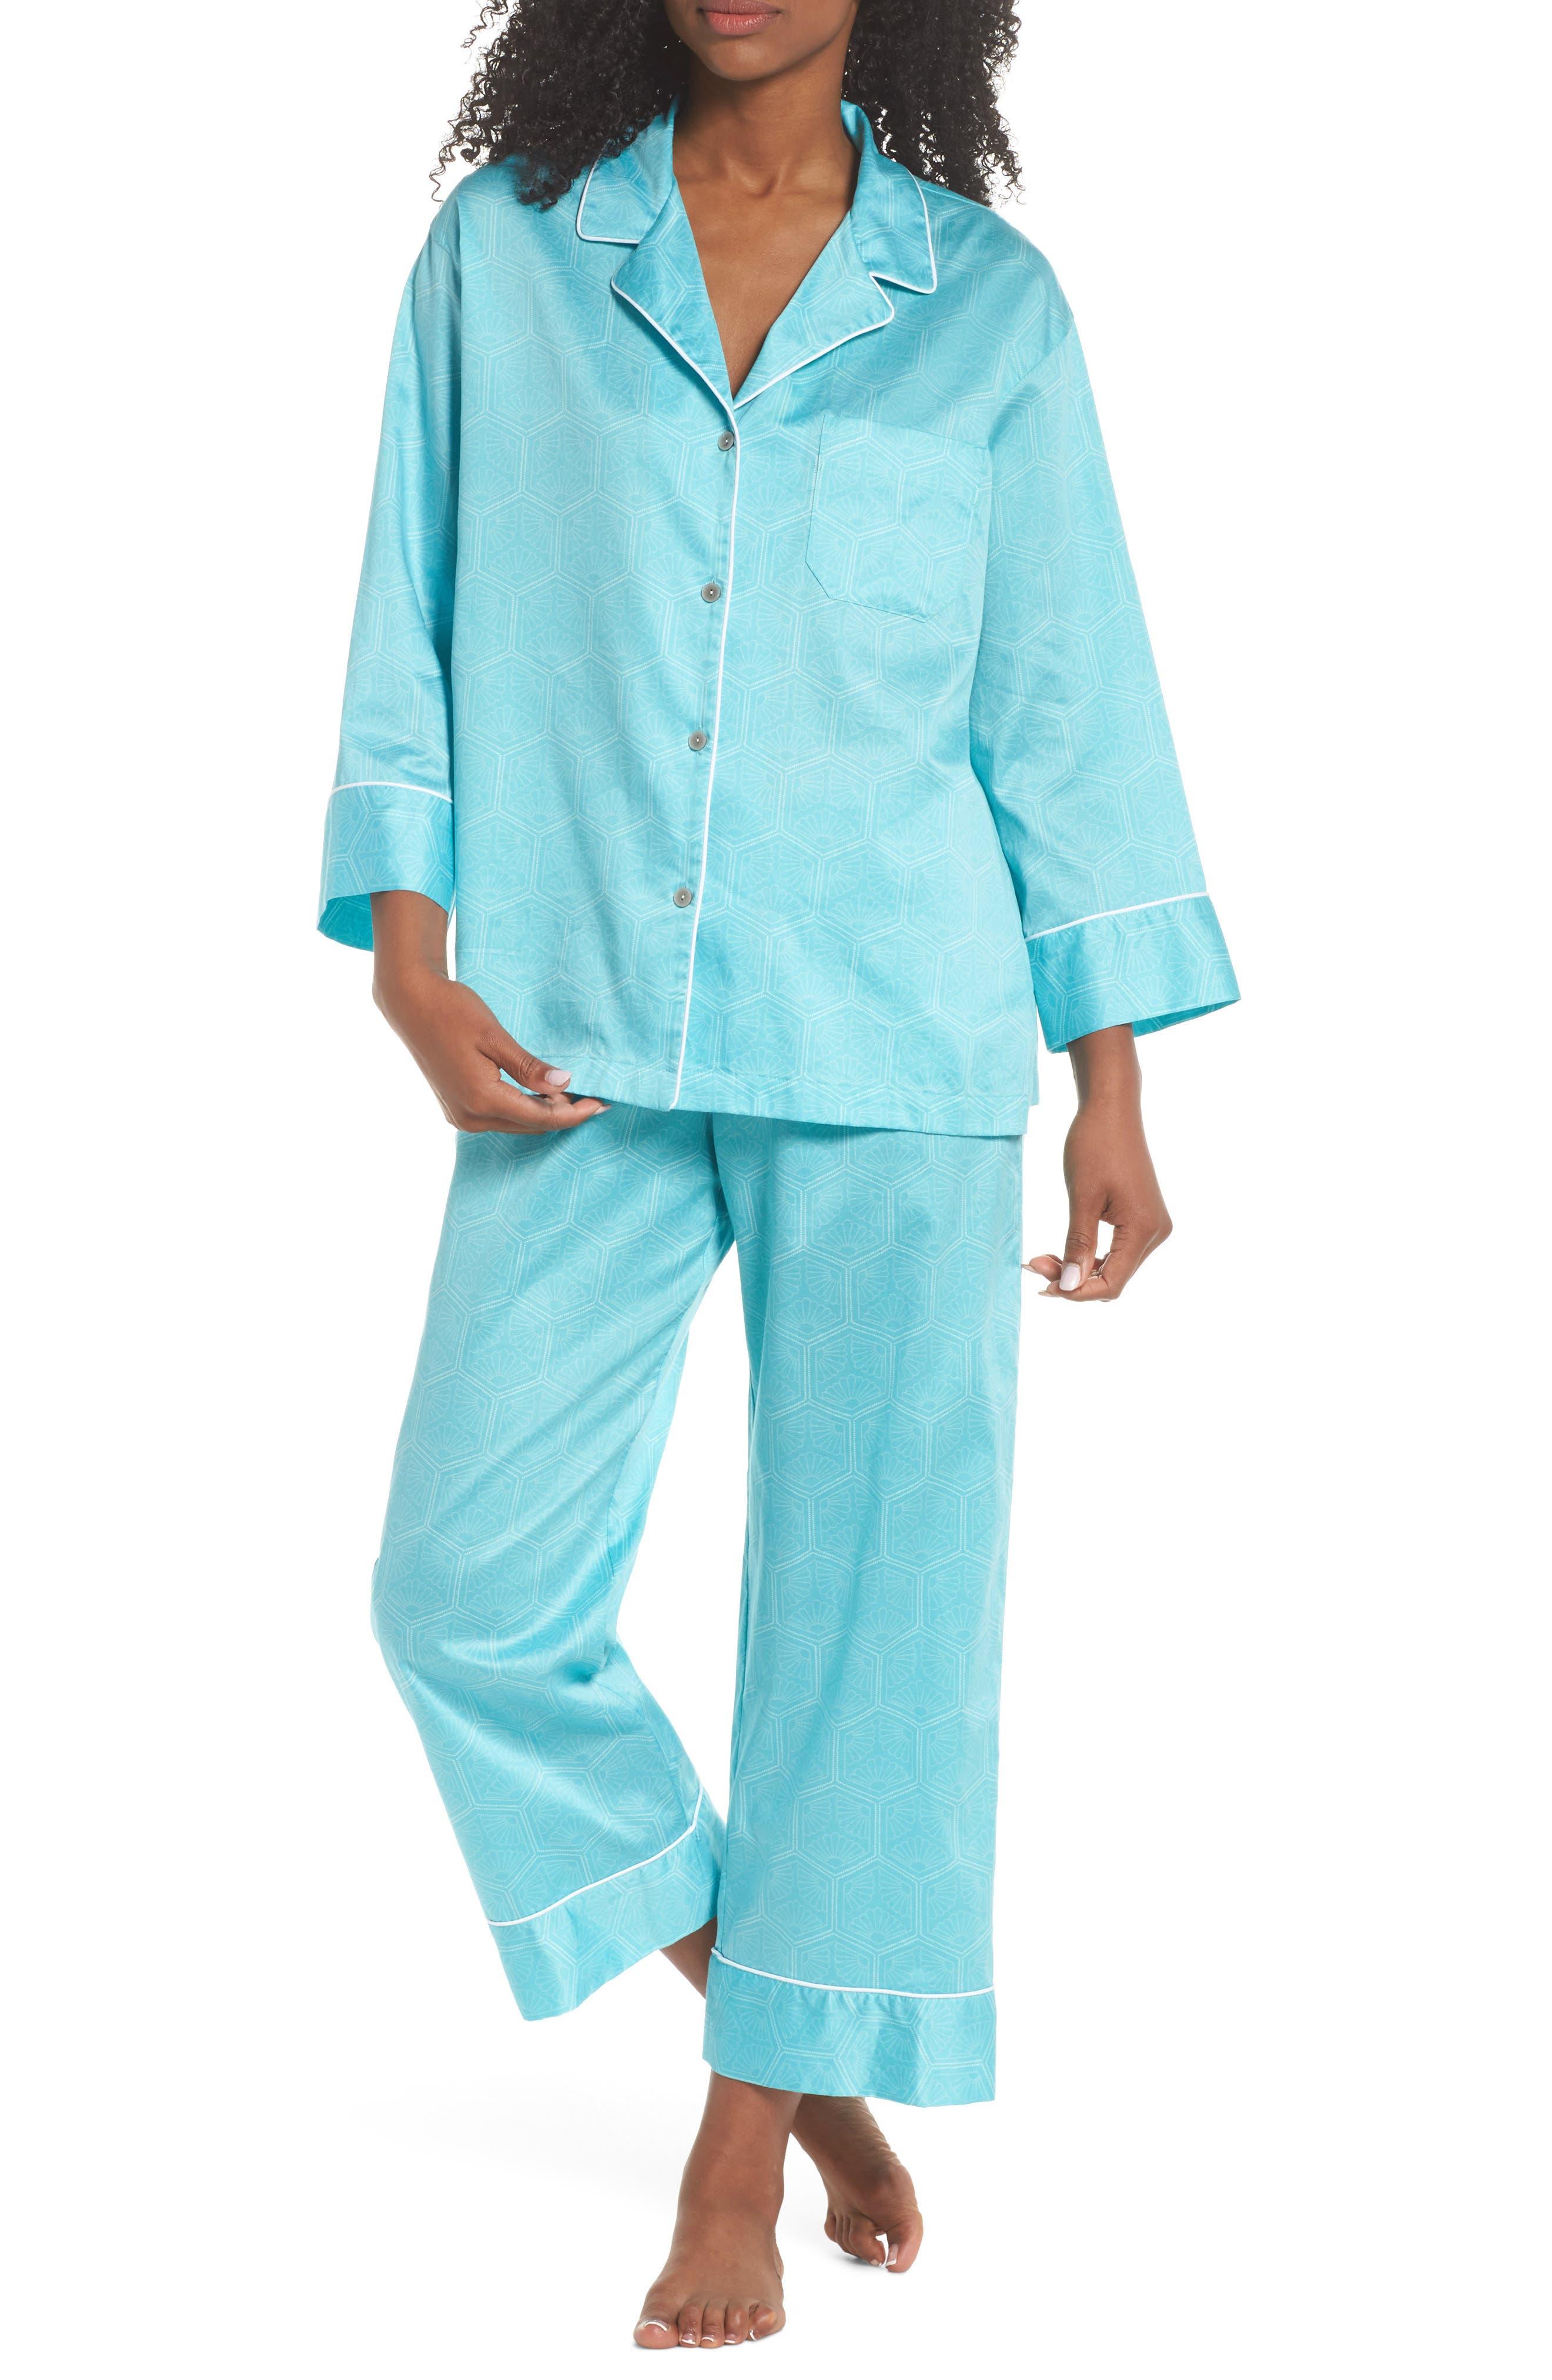 Fan Print Cotton Pajamas,                             Main thumbnail 1, color,                             Sea Glass